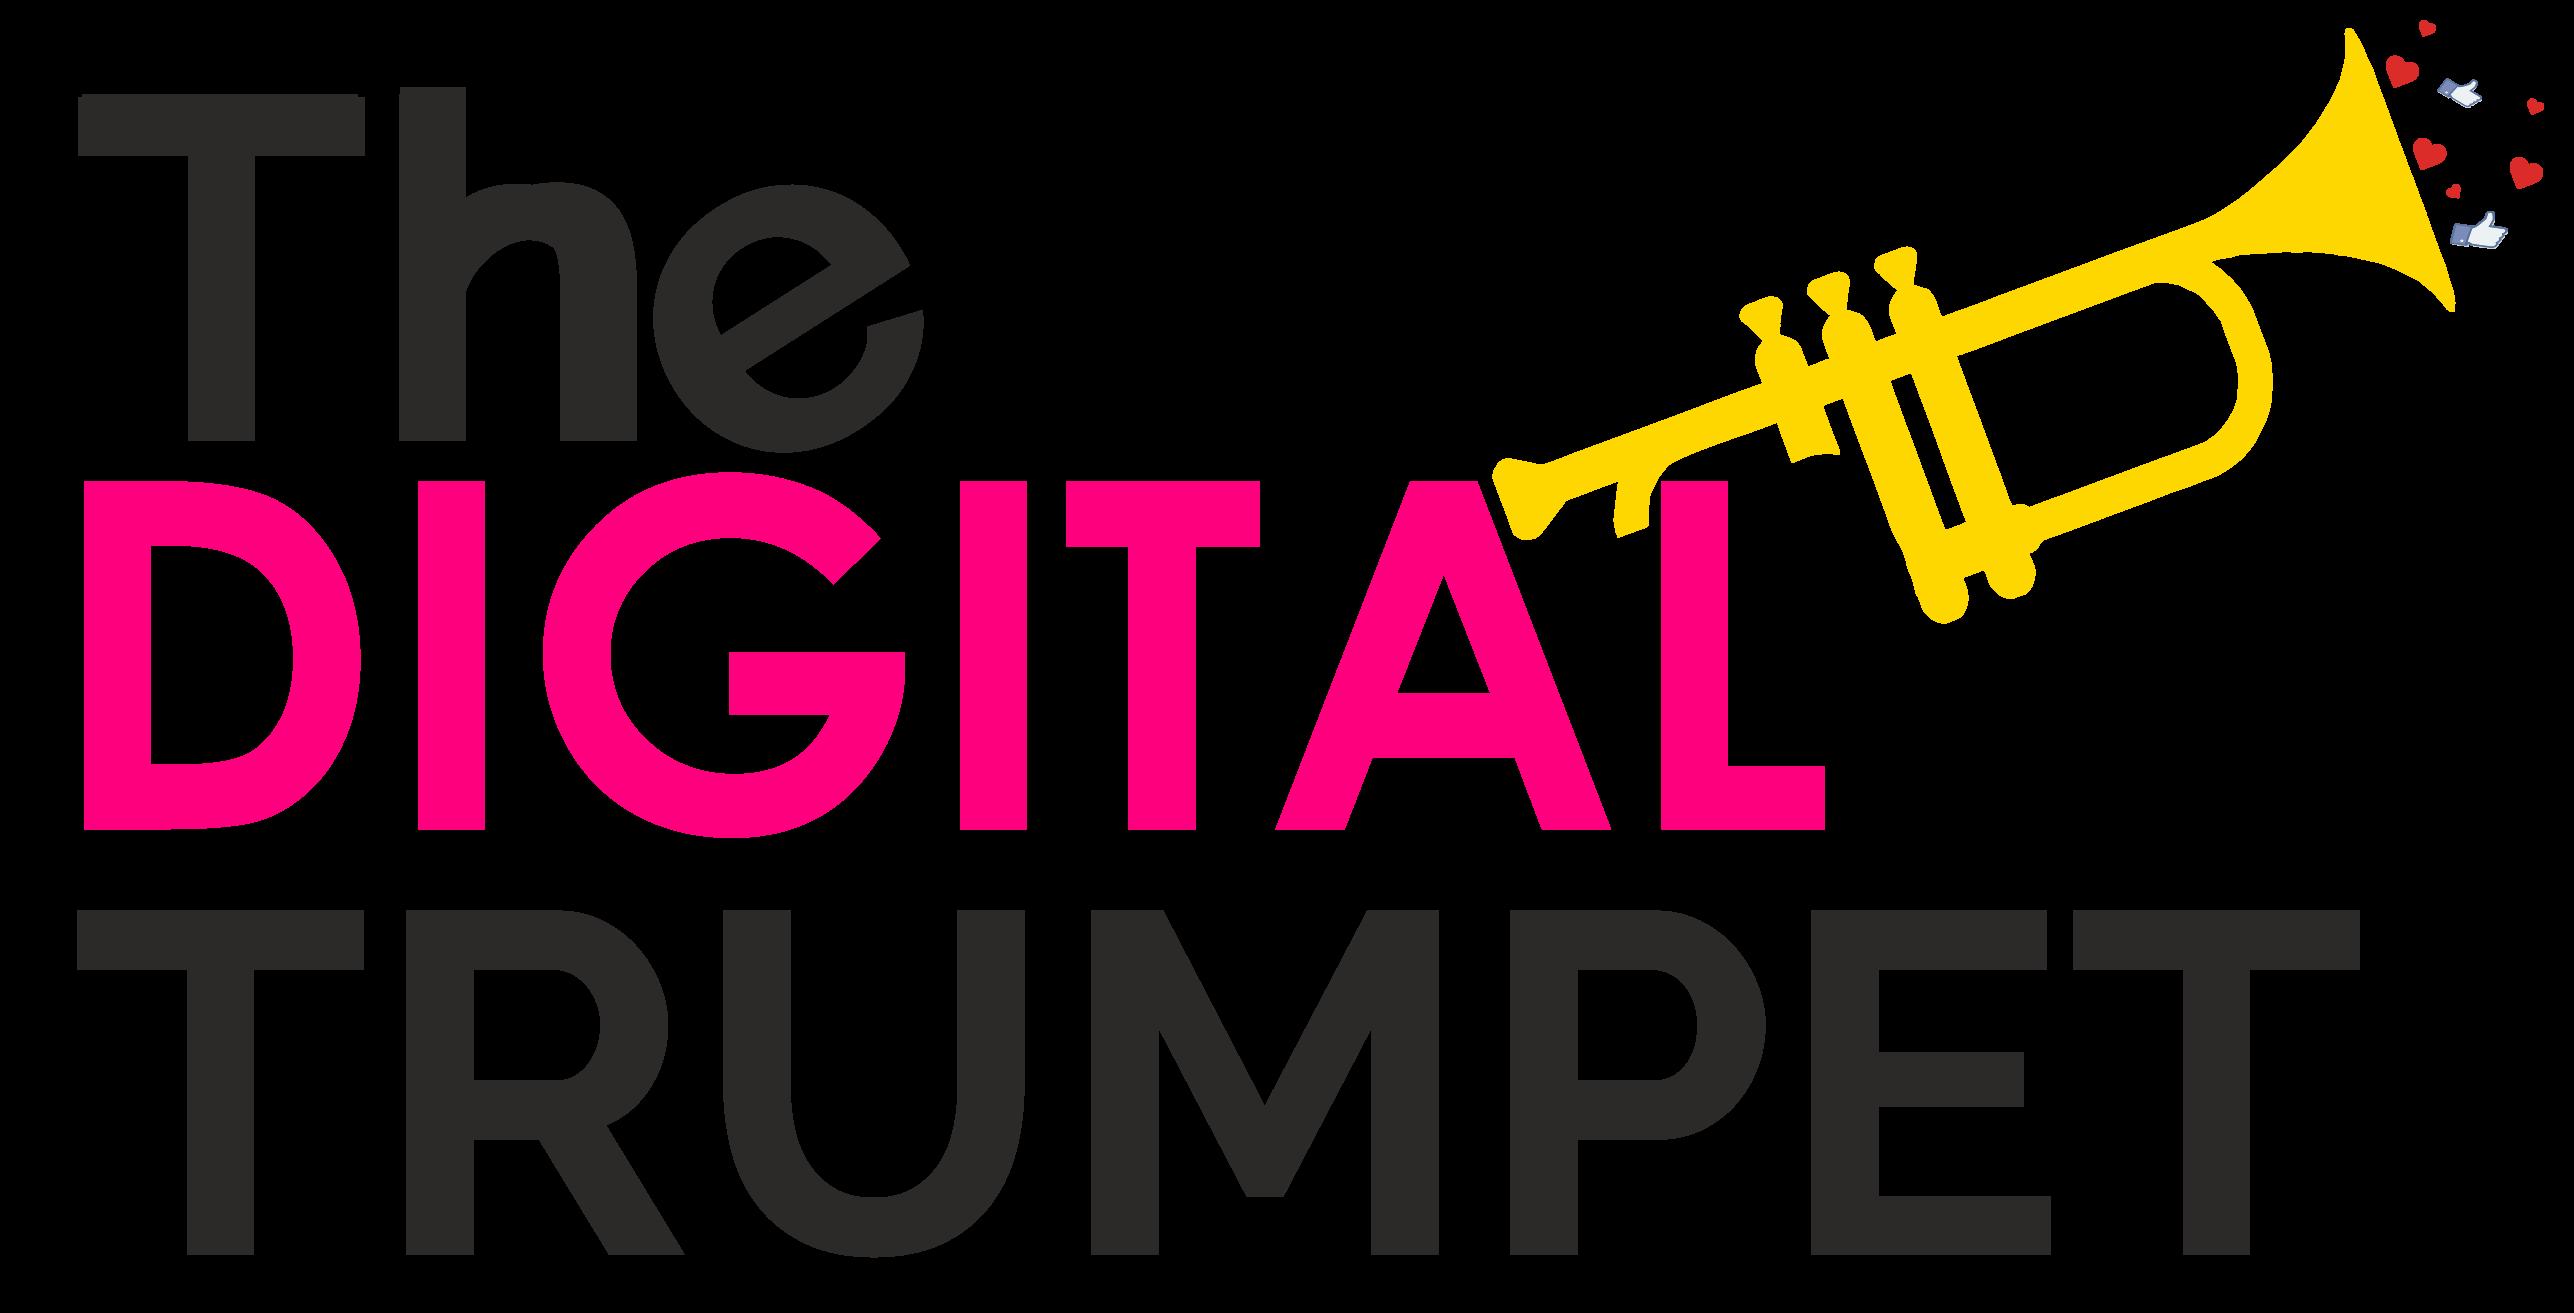 The Digital Trumpet